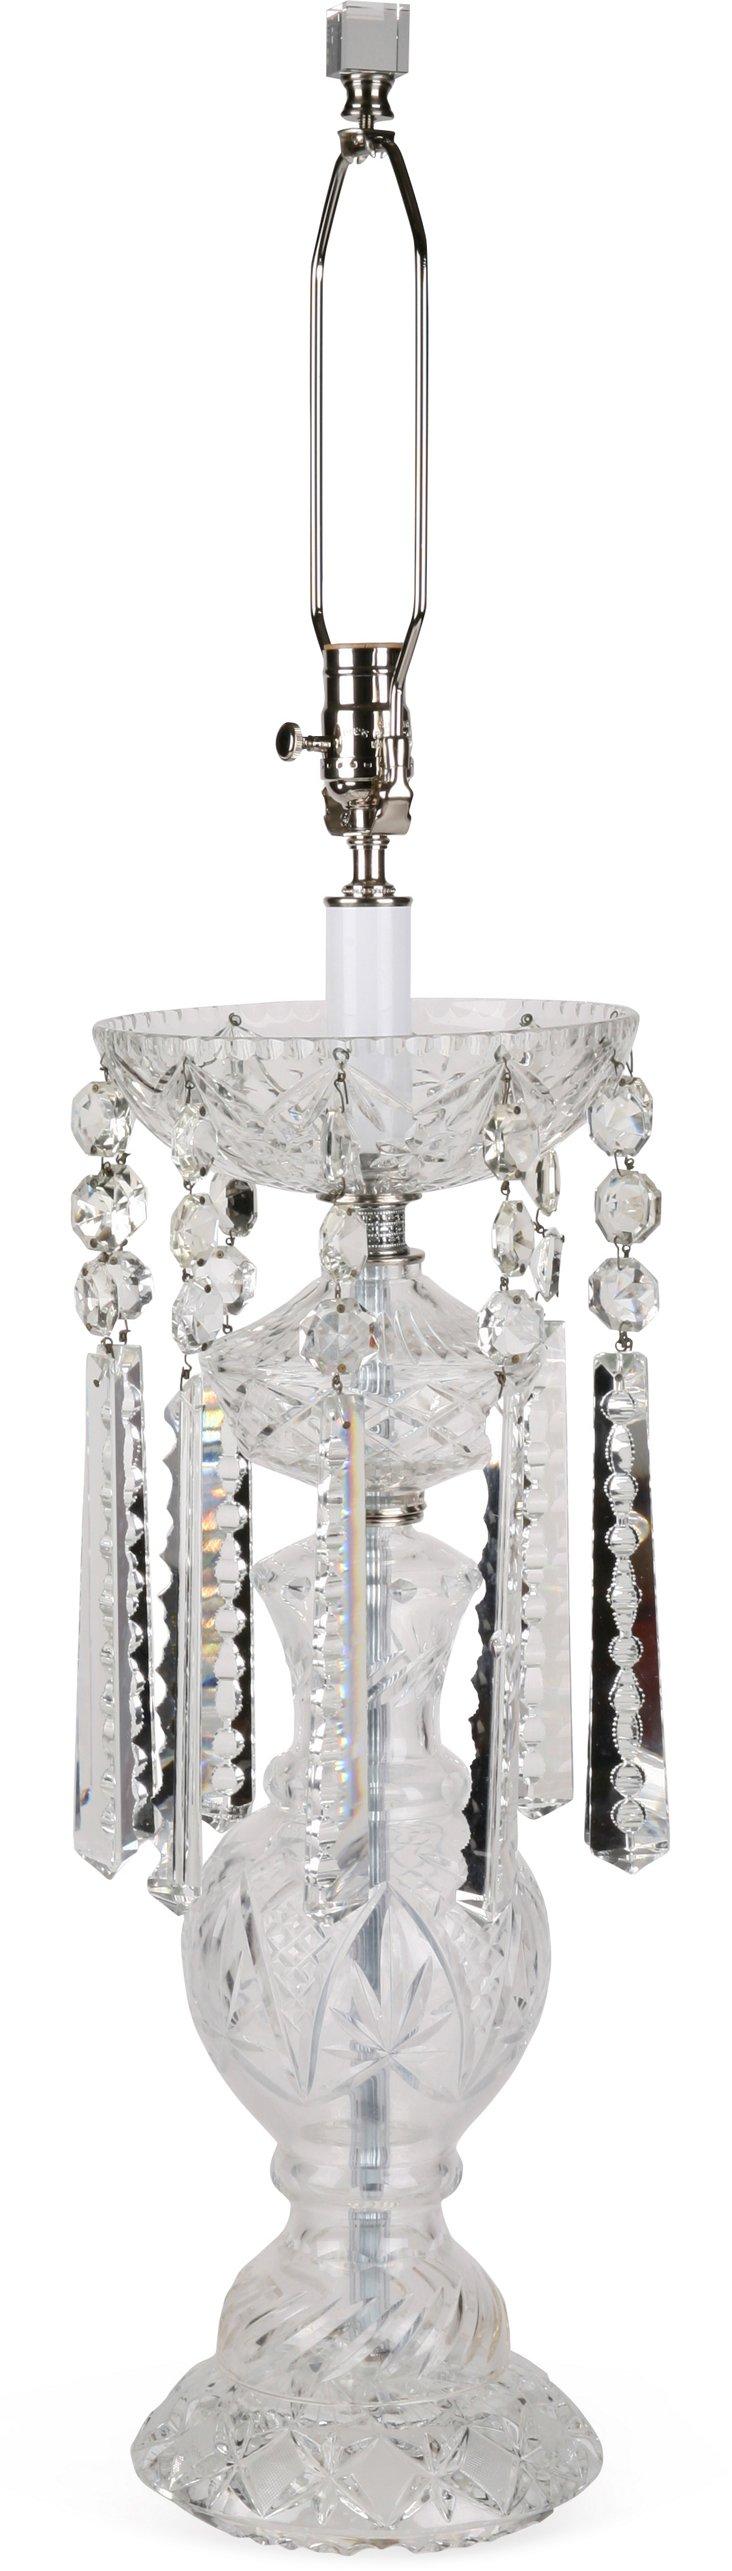 1970s Cut-Crystal Lamp